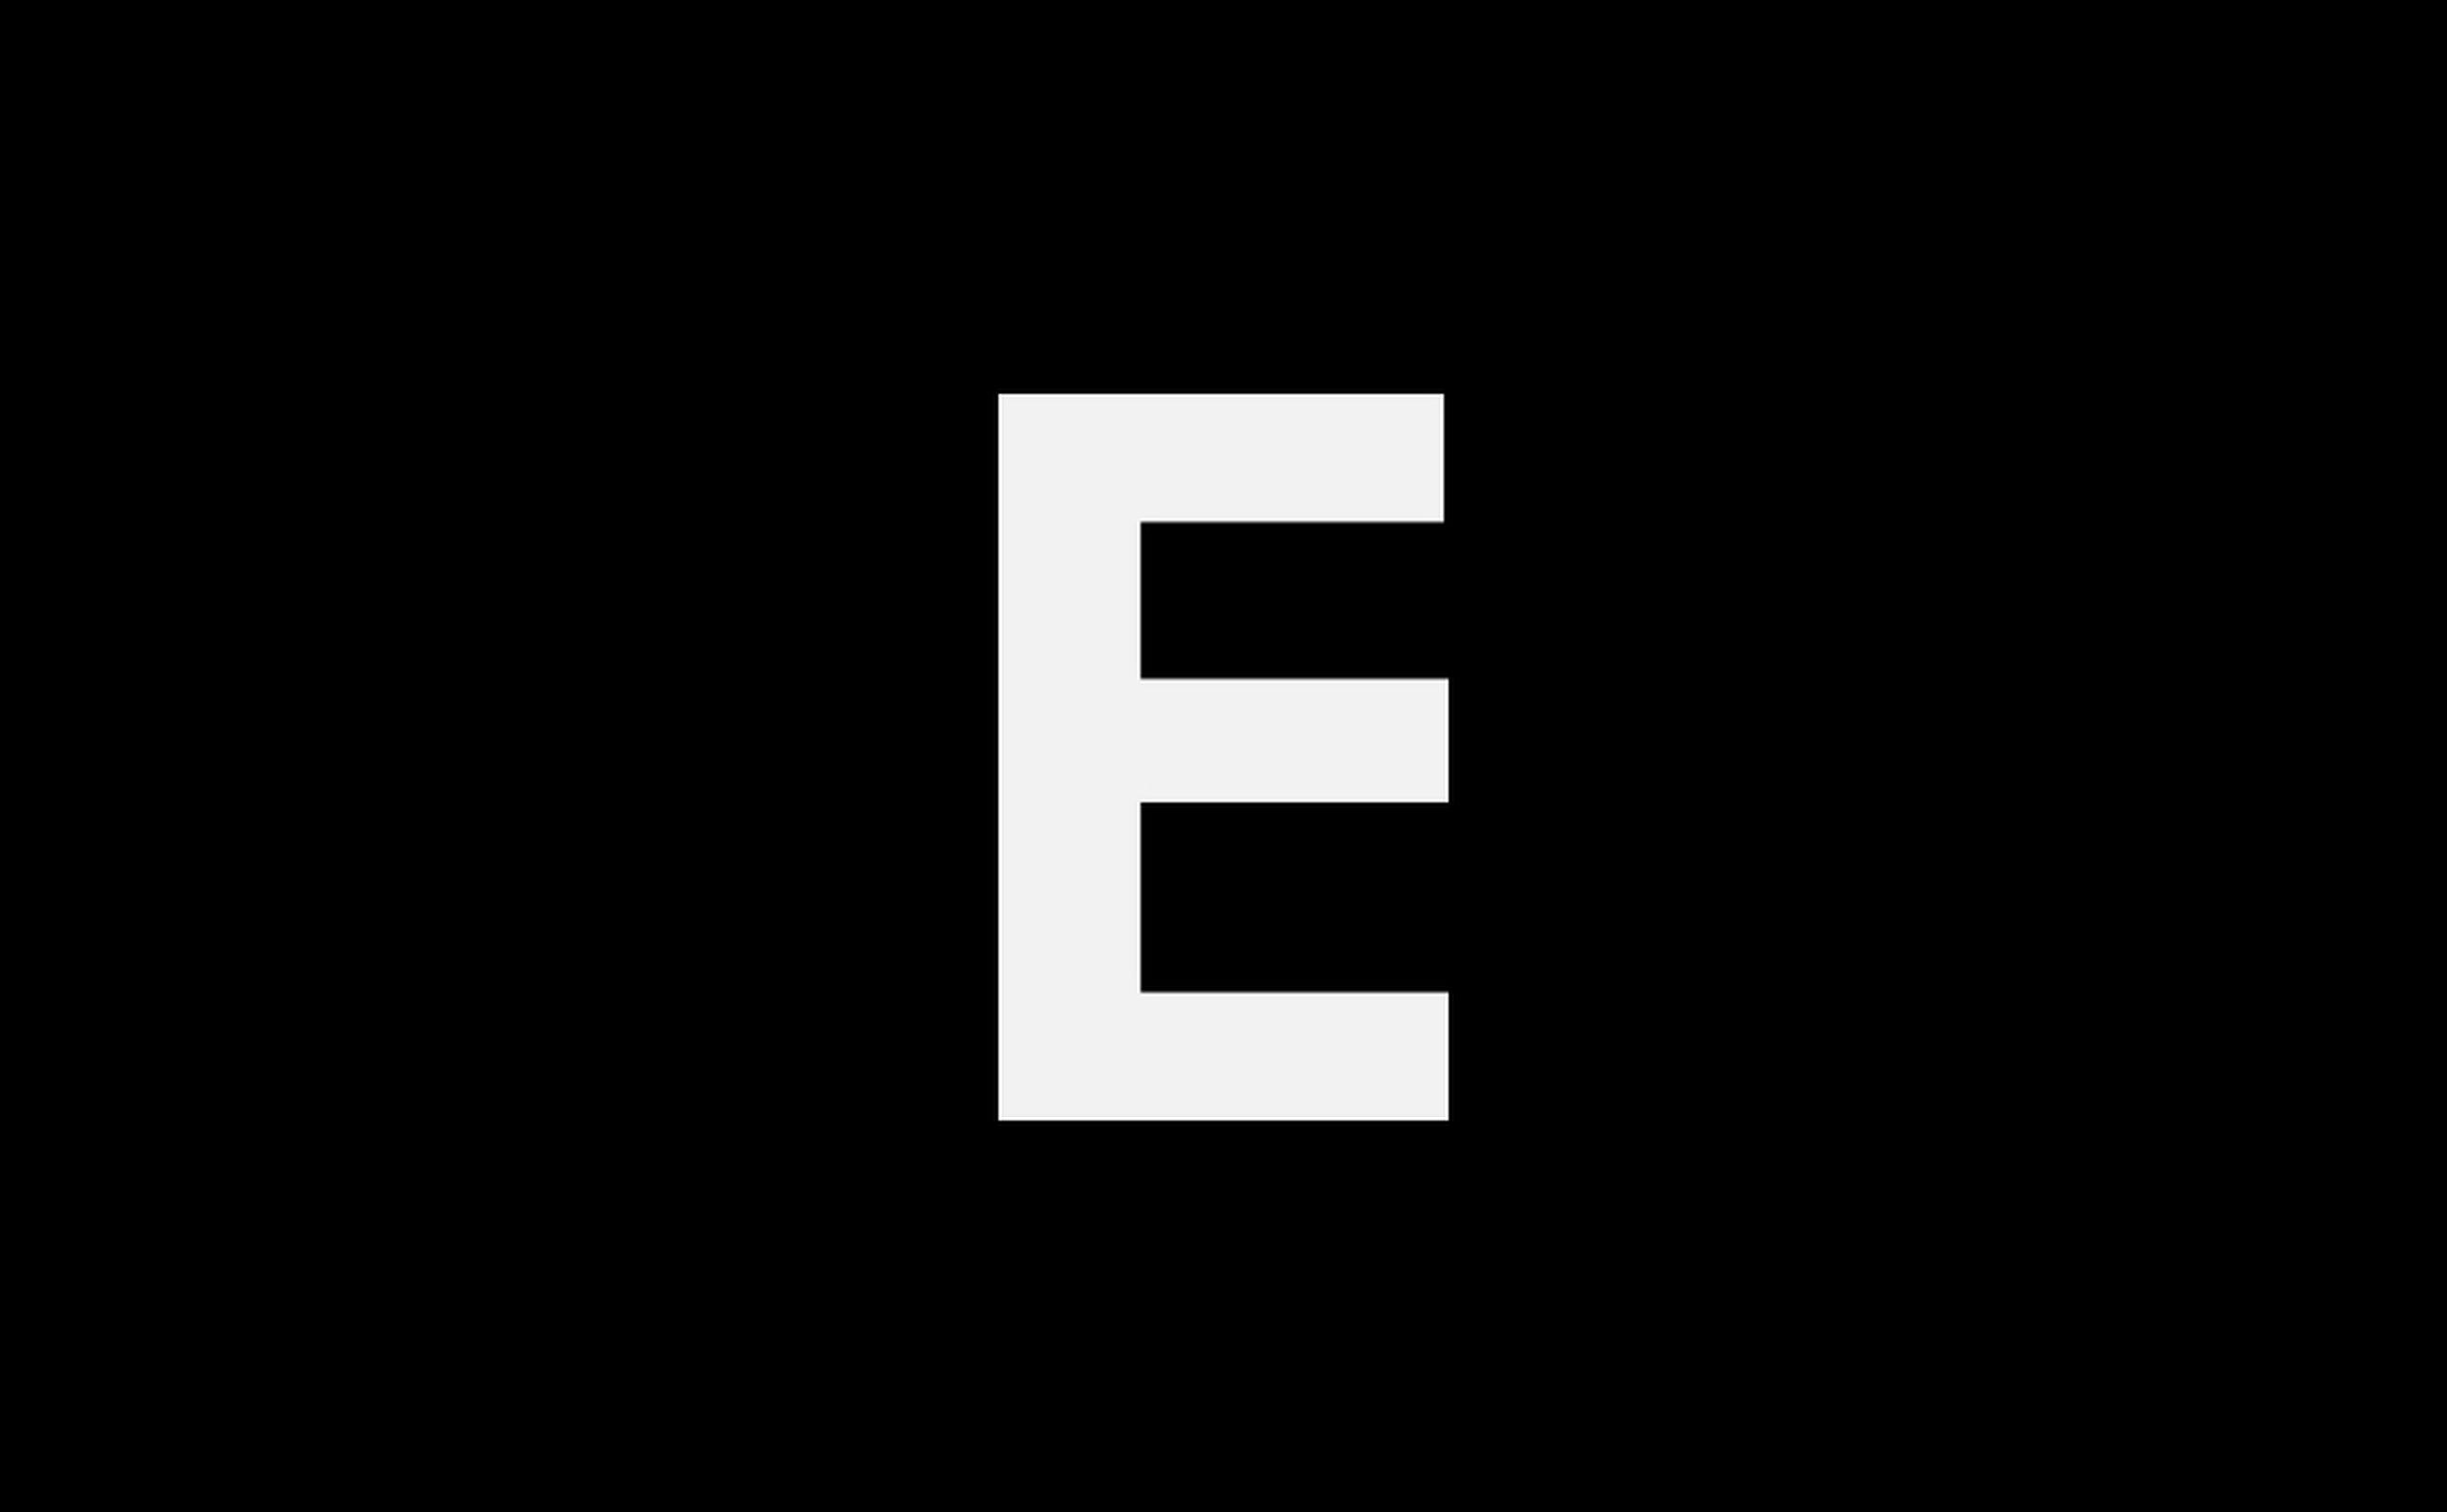 text, communication, western script, built structure, architecture, indoors, paper, no people, sign, capital letter, building exterior, information, close-up, high angle view, information sign, non-western script, wall - building feature, day, book, low angle view